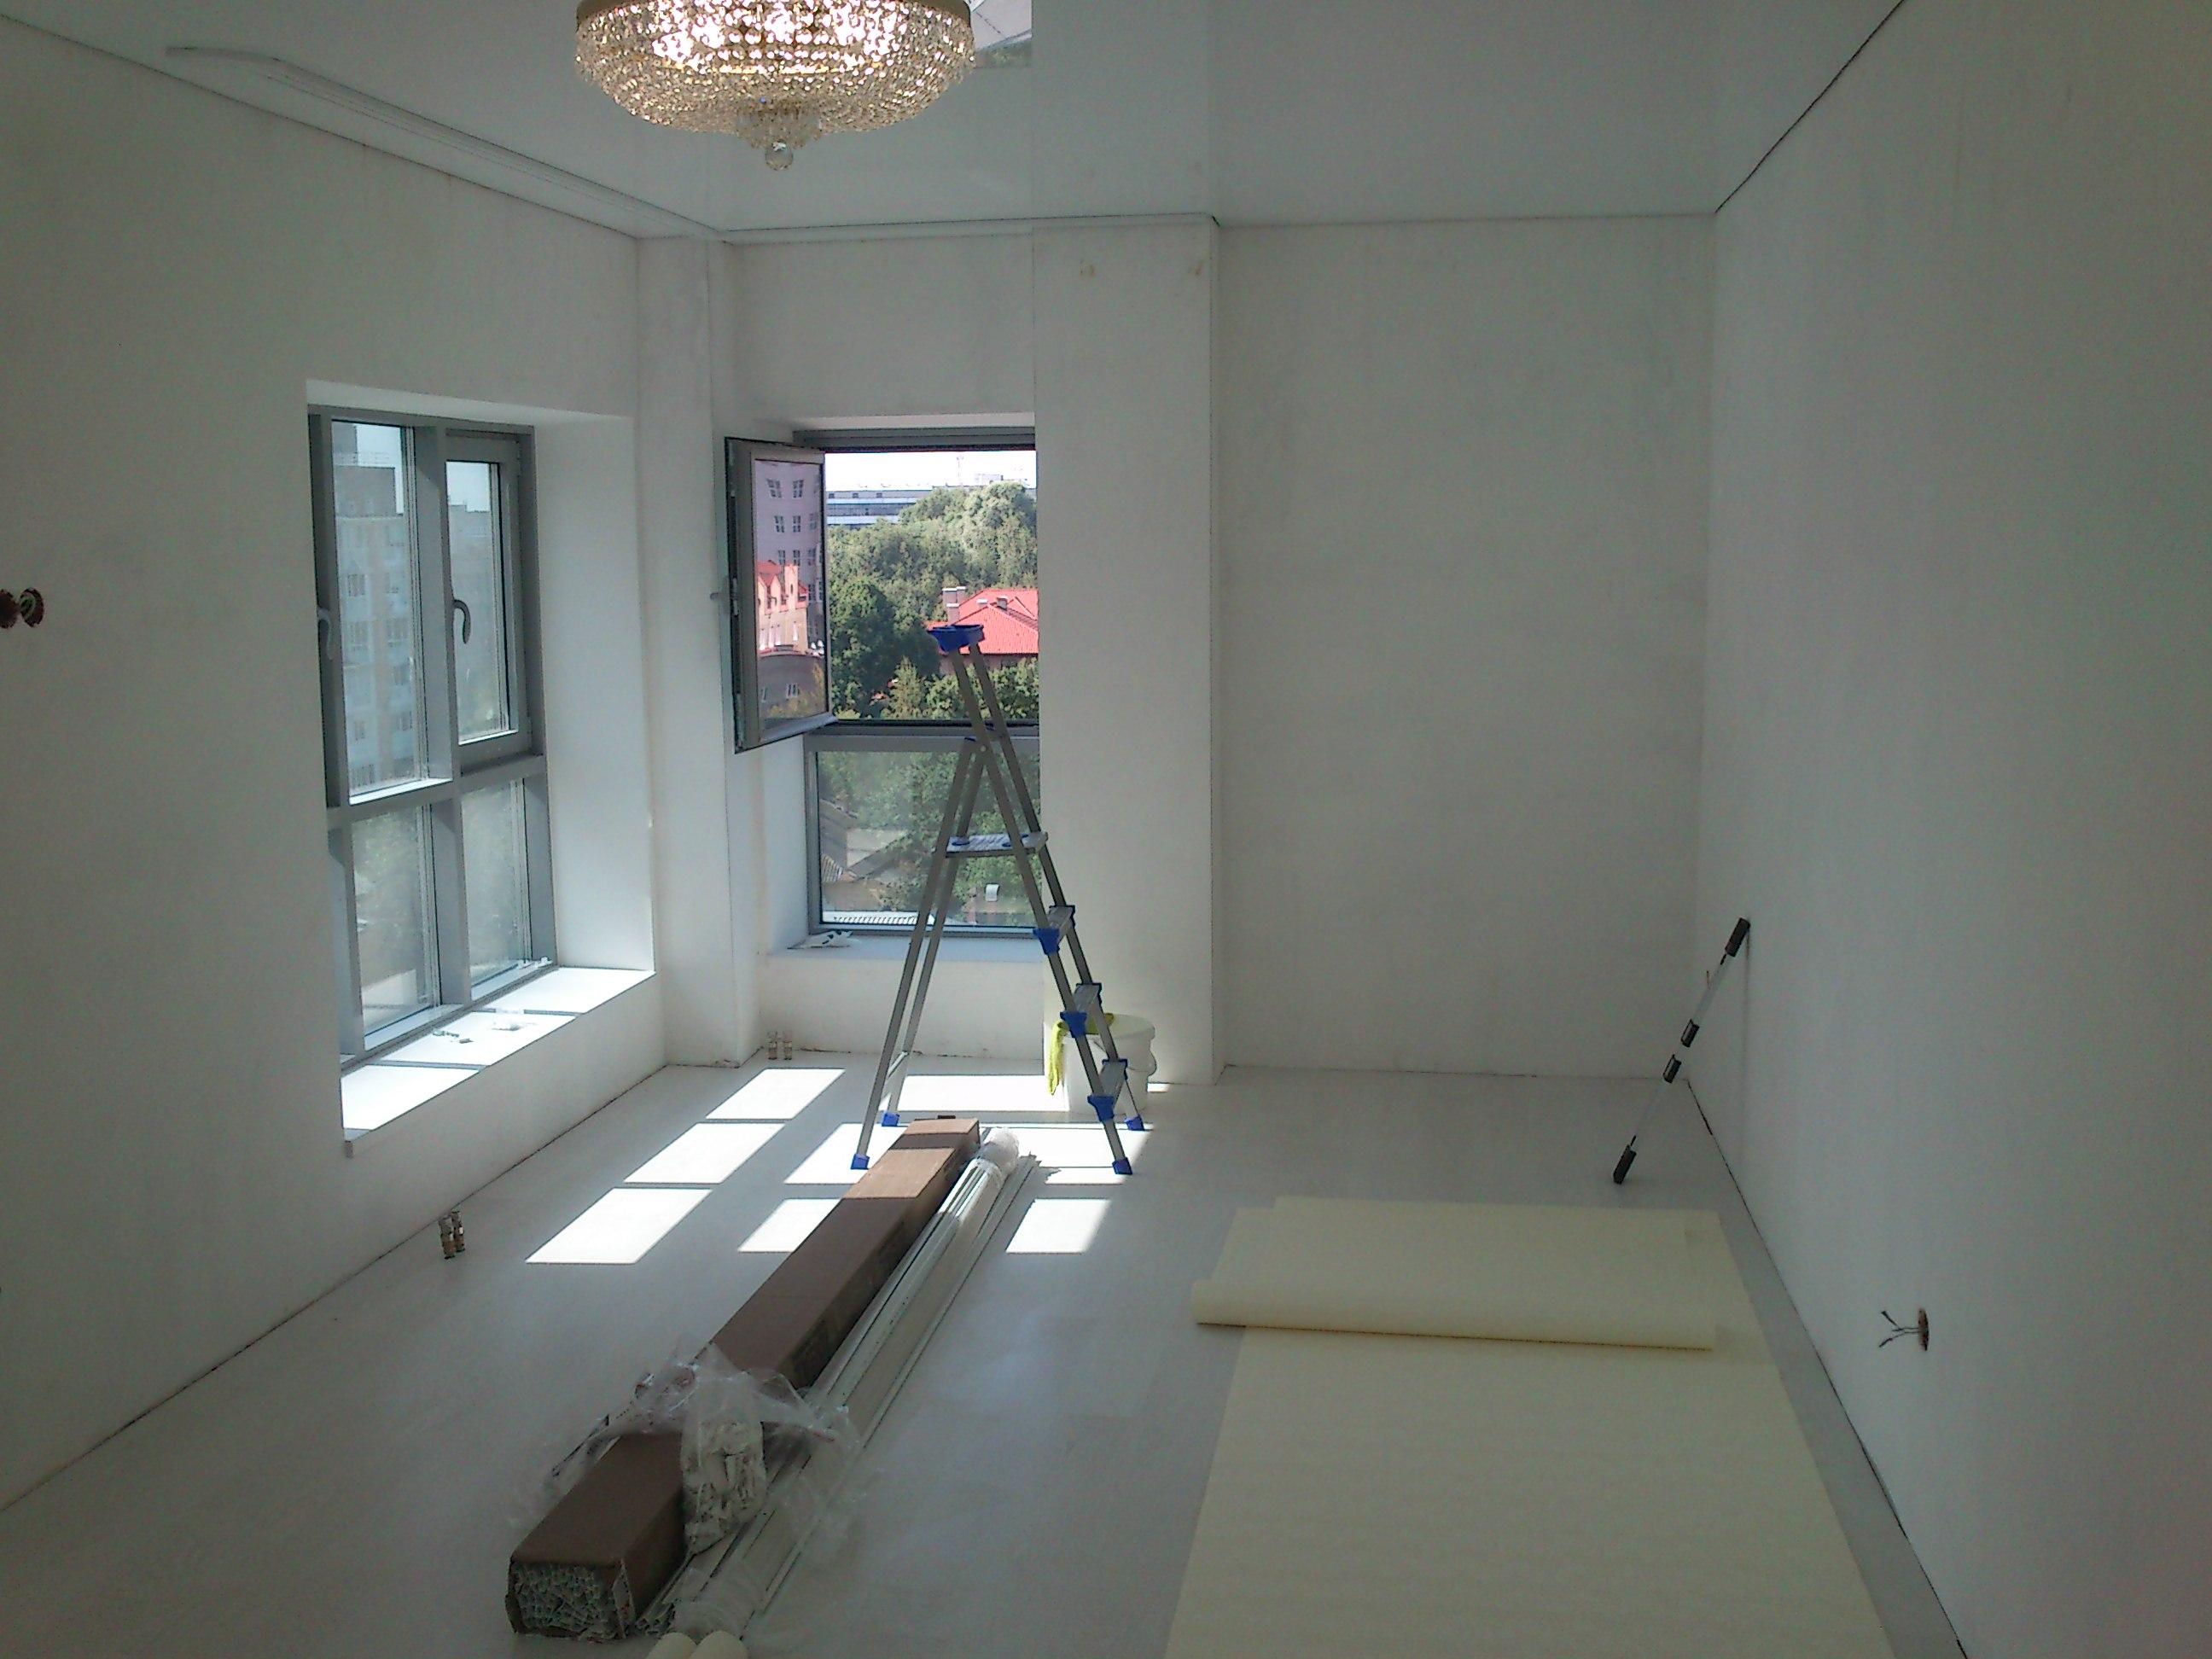 Шпаклевка стен  и потолков,покраска,поклейка обоев.